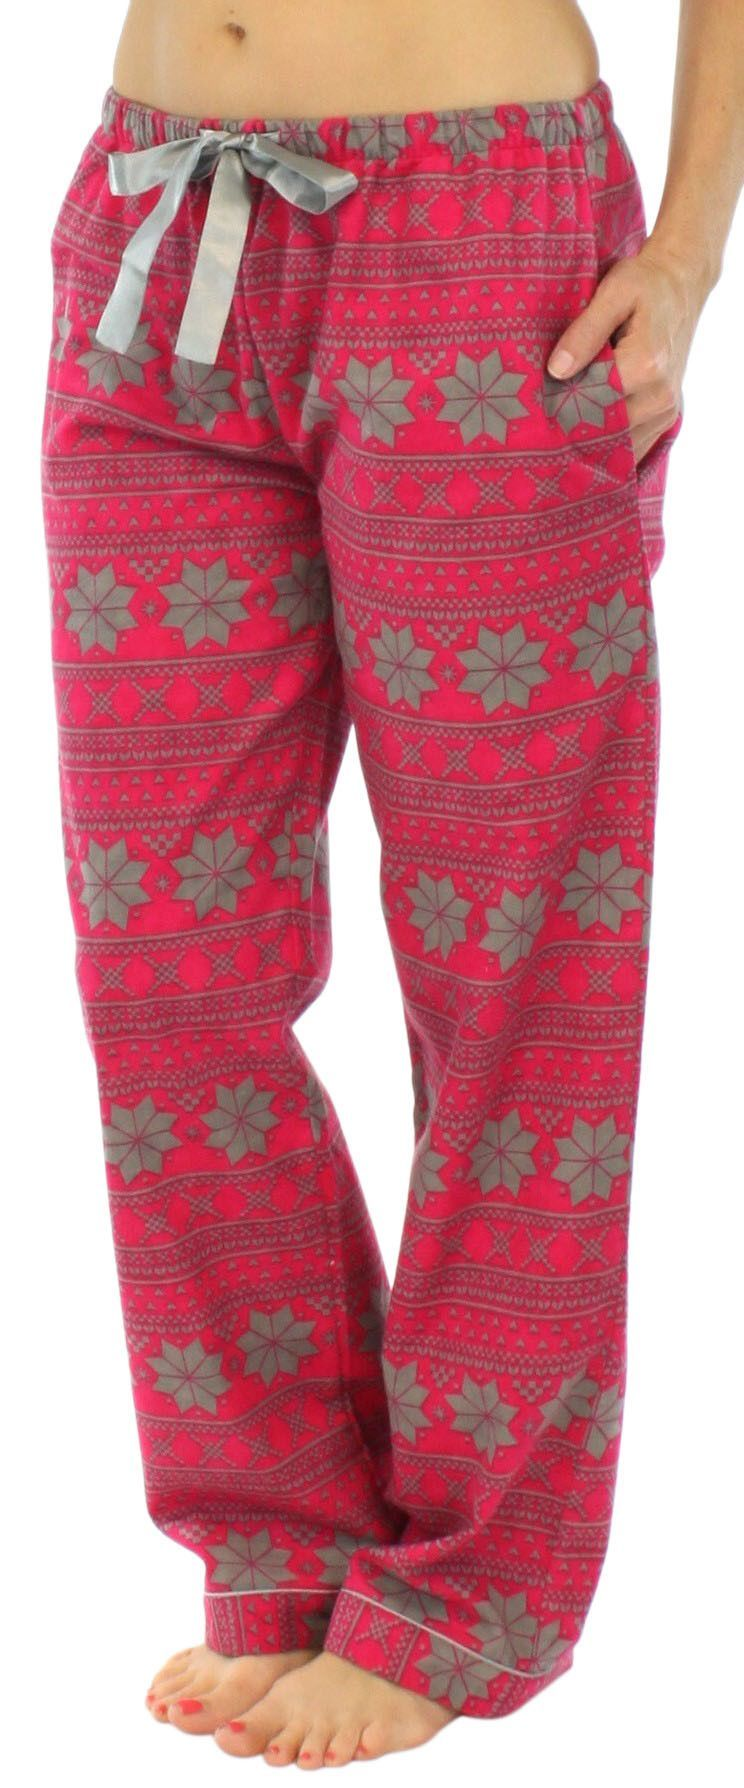 PajamaMania Women's Flannel Pajama Pants | Warm, Satin and Products